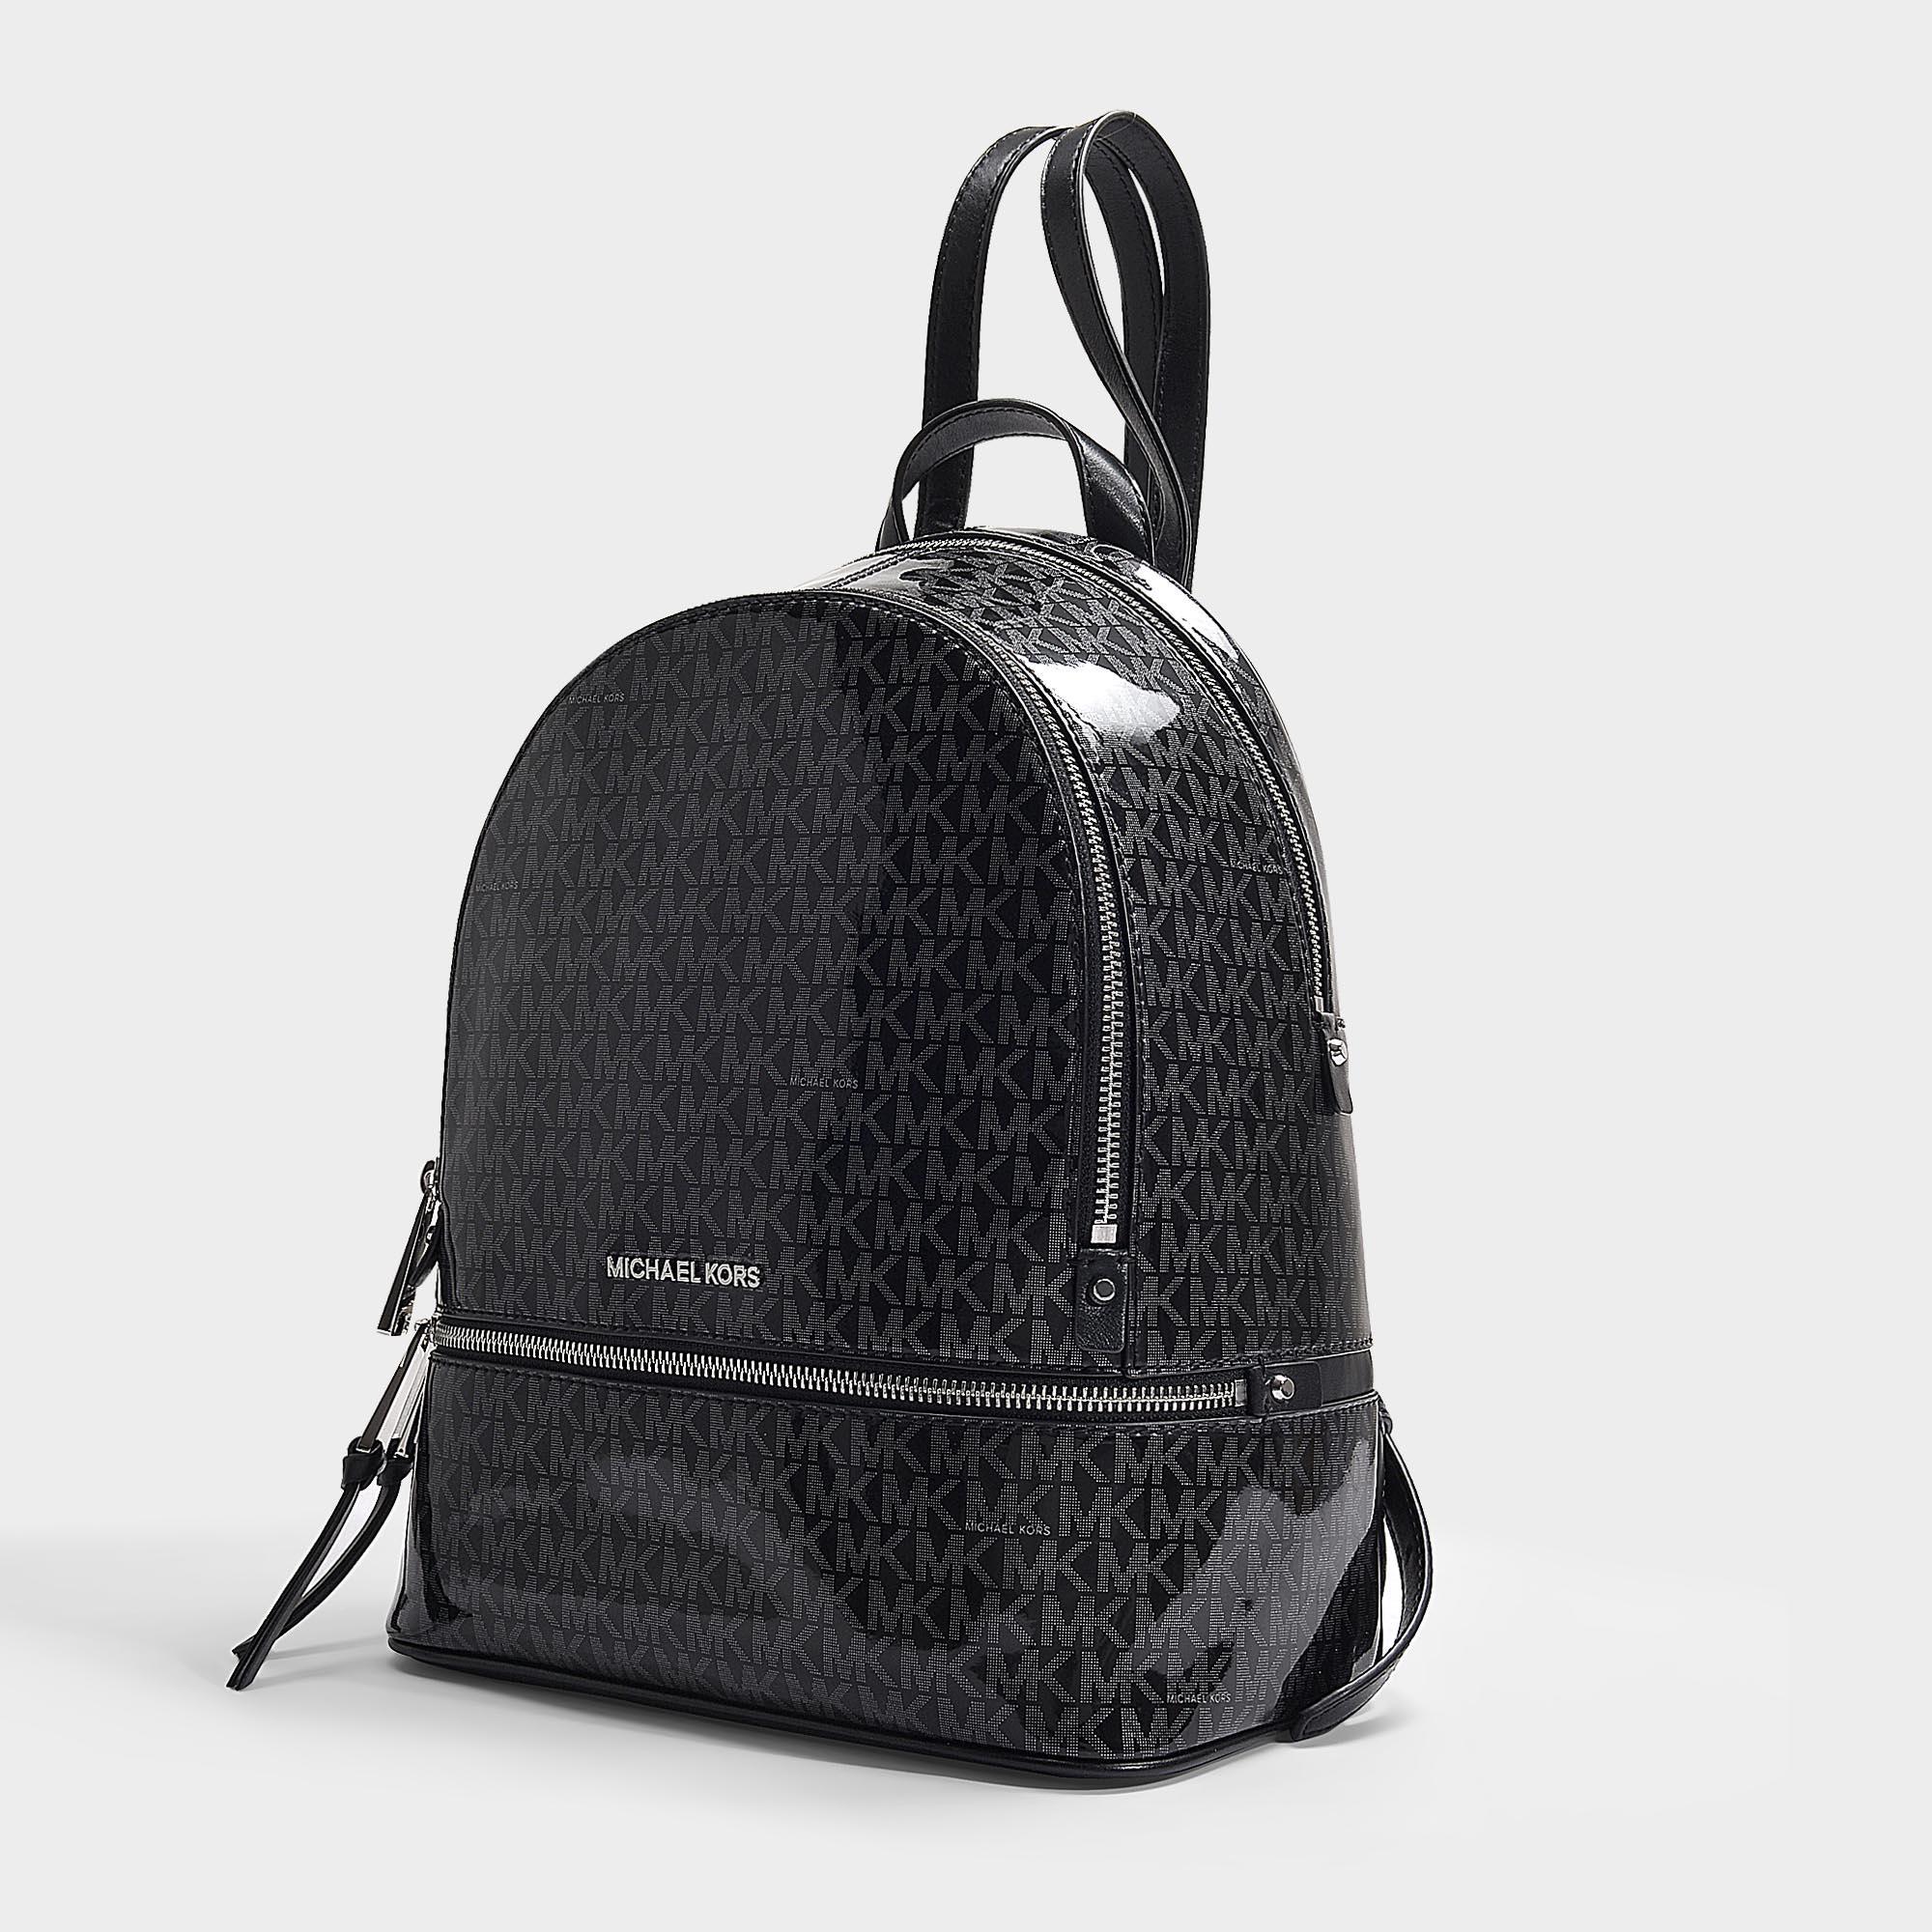 34fb35efe49c34 MICHAEL Michael Kors - Rhea Zip Medium Backpack In Black And Silver Pvc -  Lyst. View fullscreen